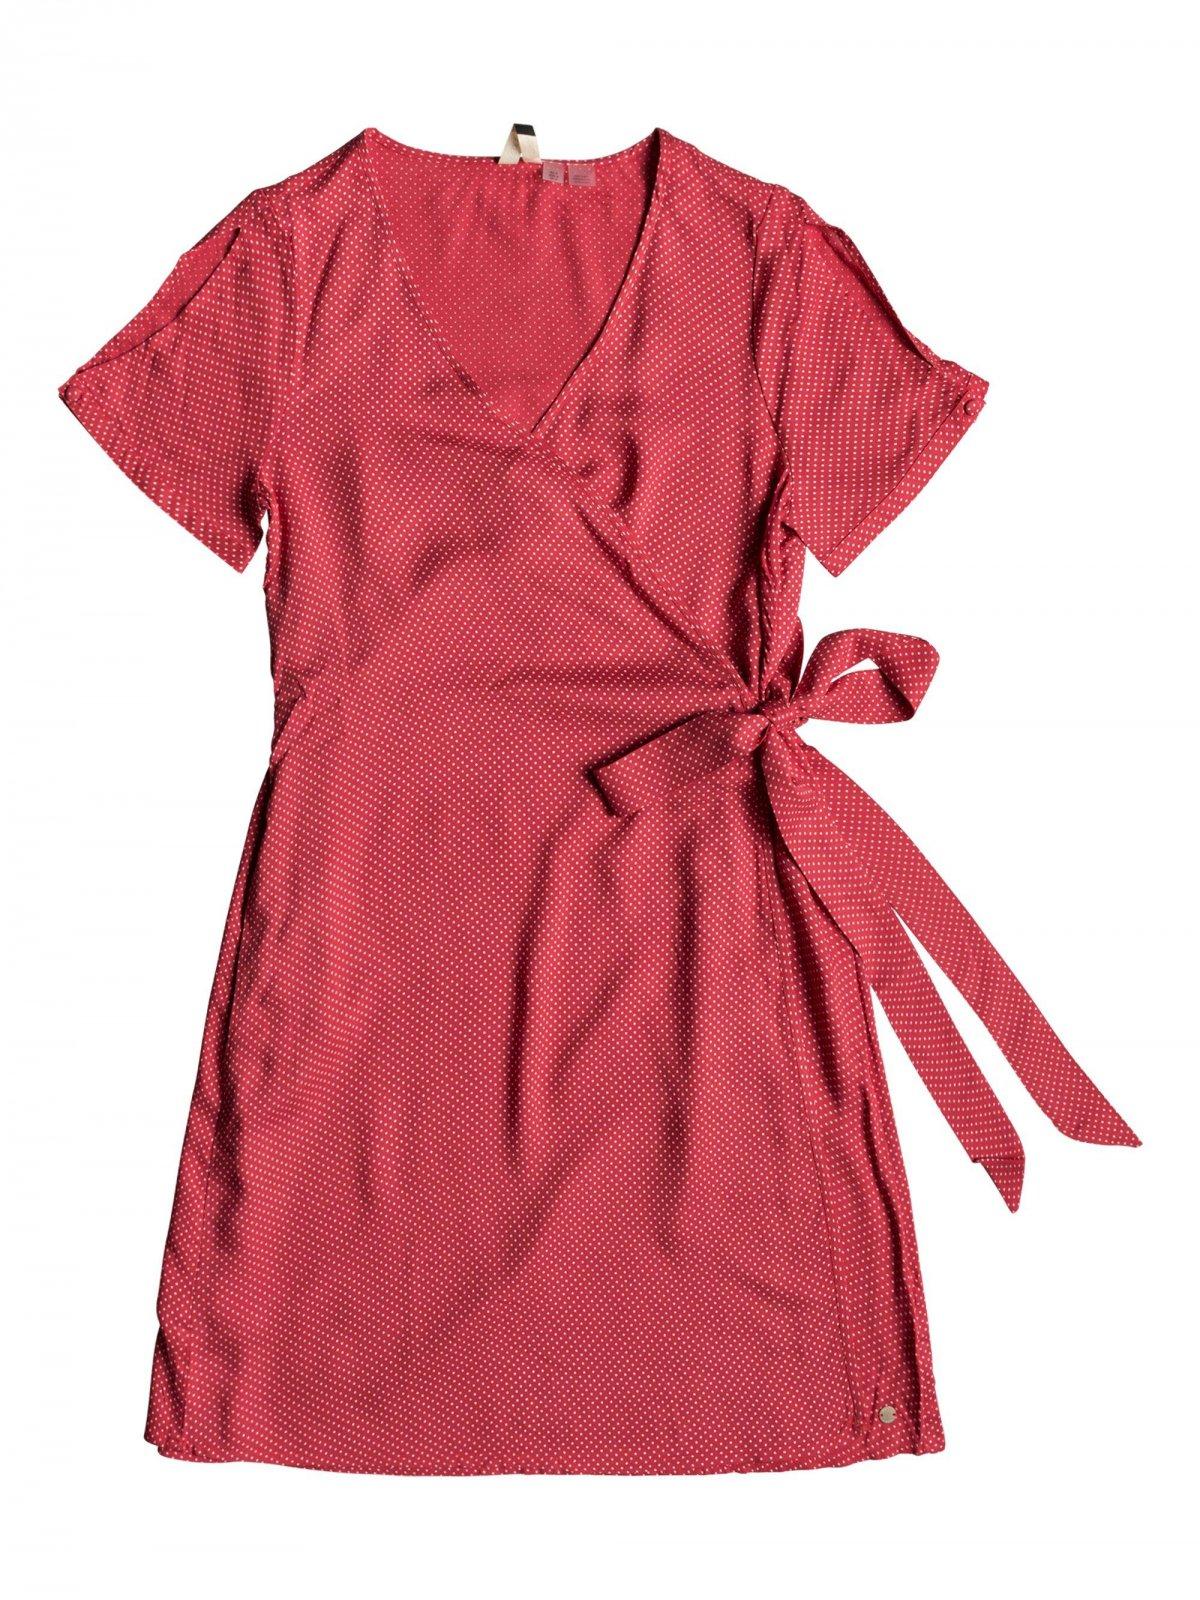 Roxy Monument View Dress American Beauty Polkadot